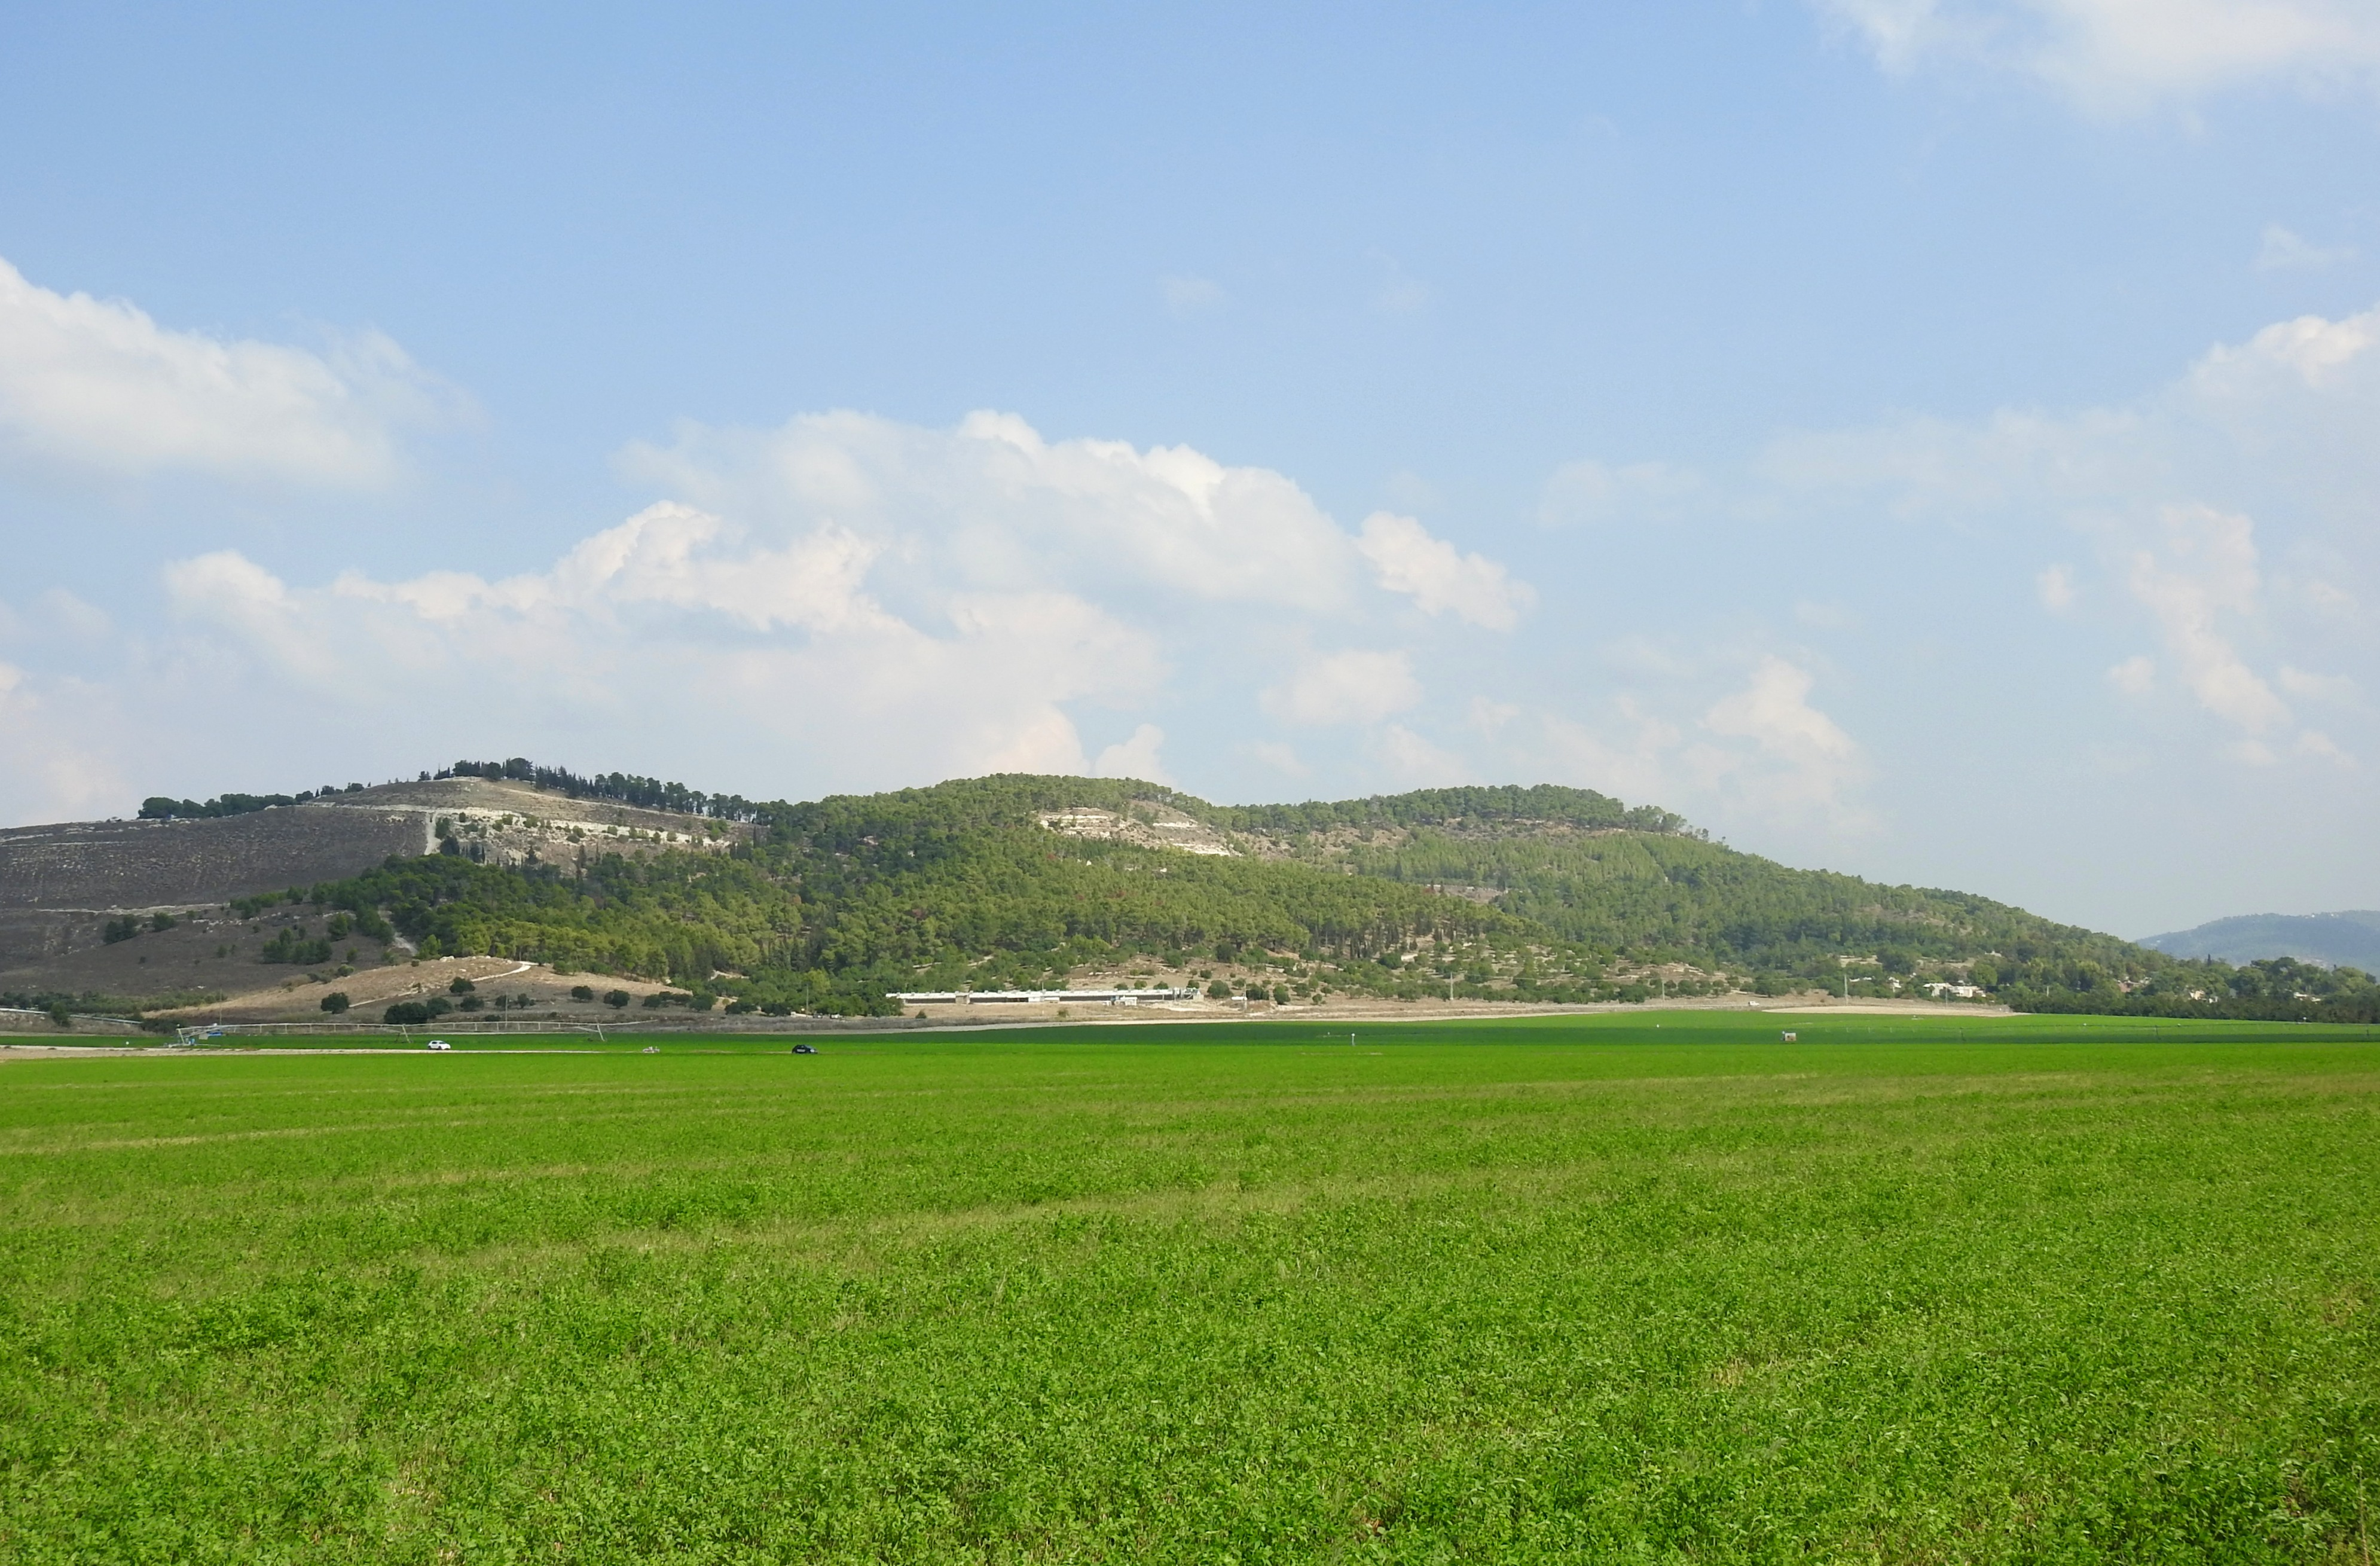 The lush green fields of Tzora